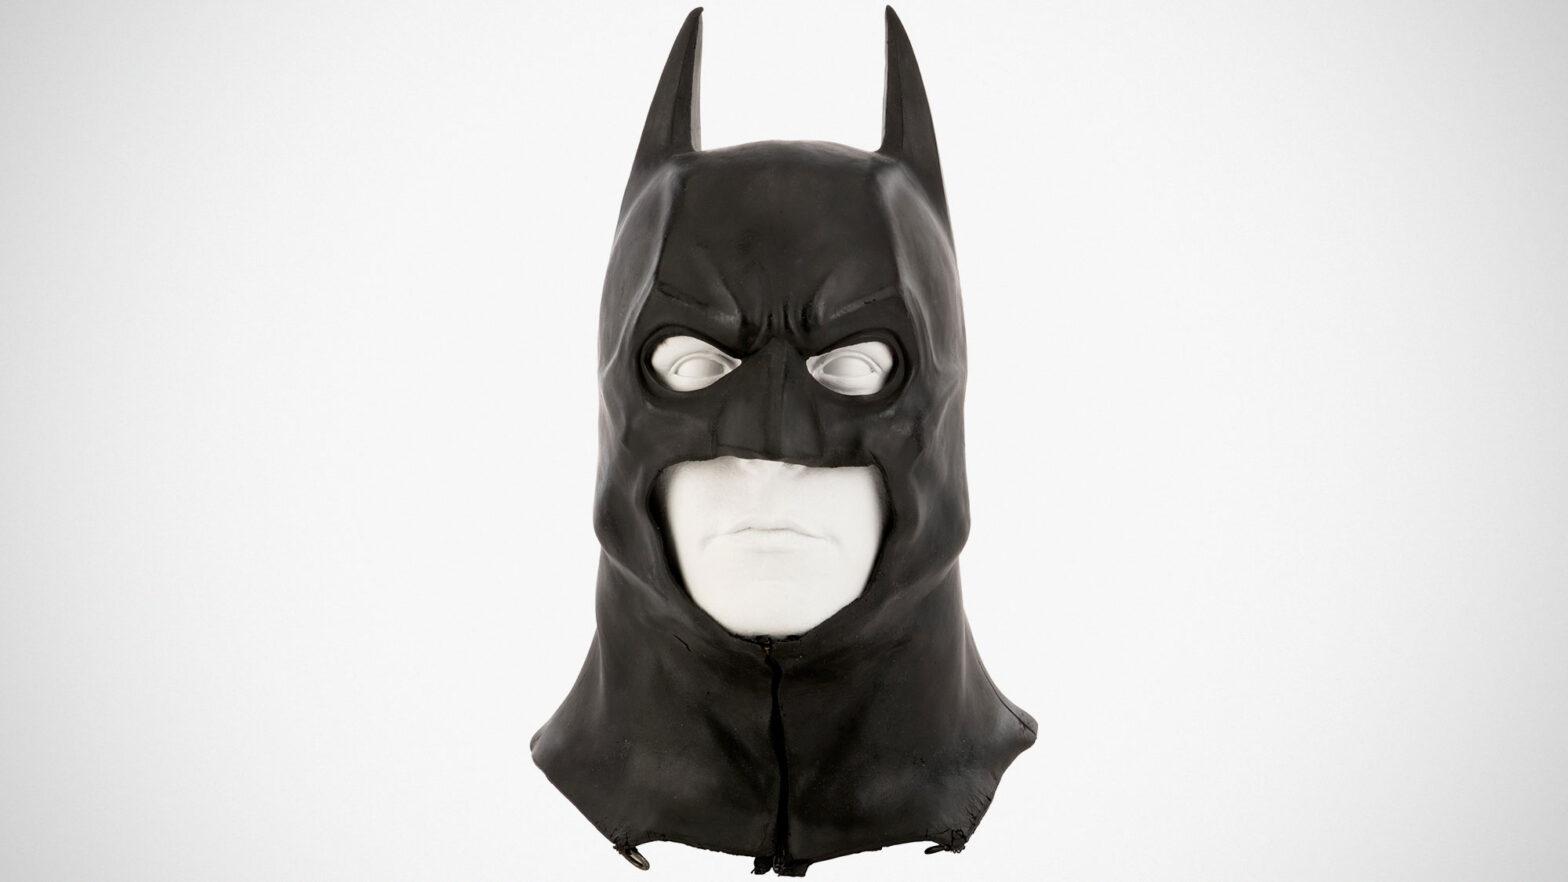 Christian Bale Batman Cowl Batman Begins